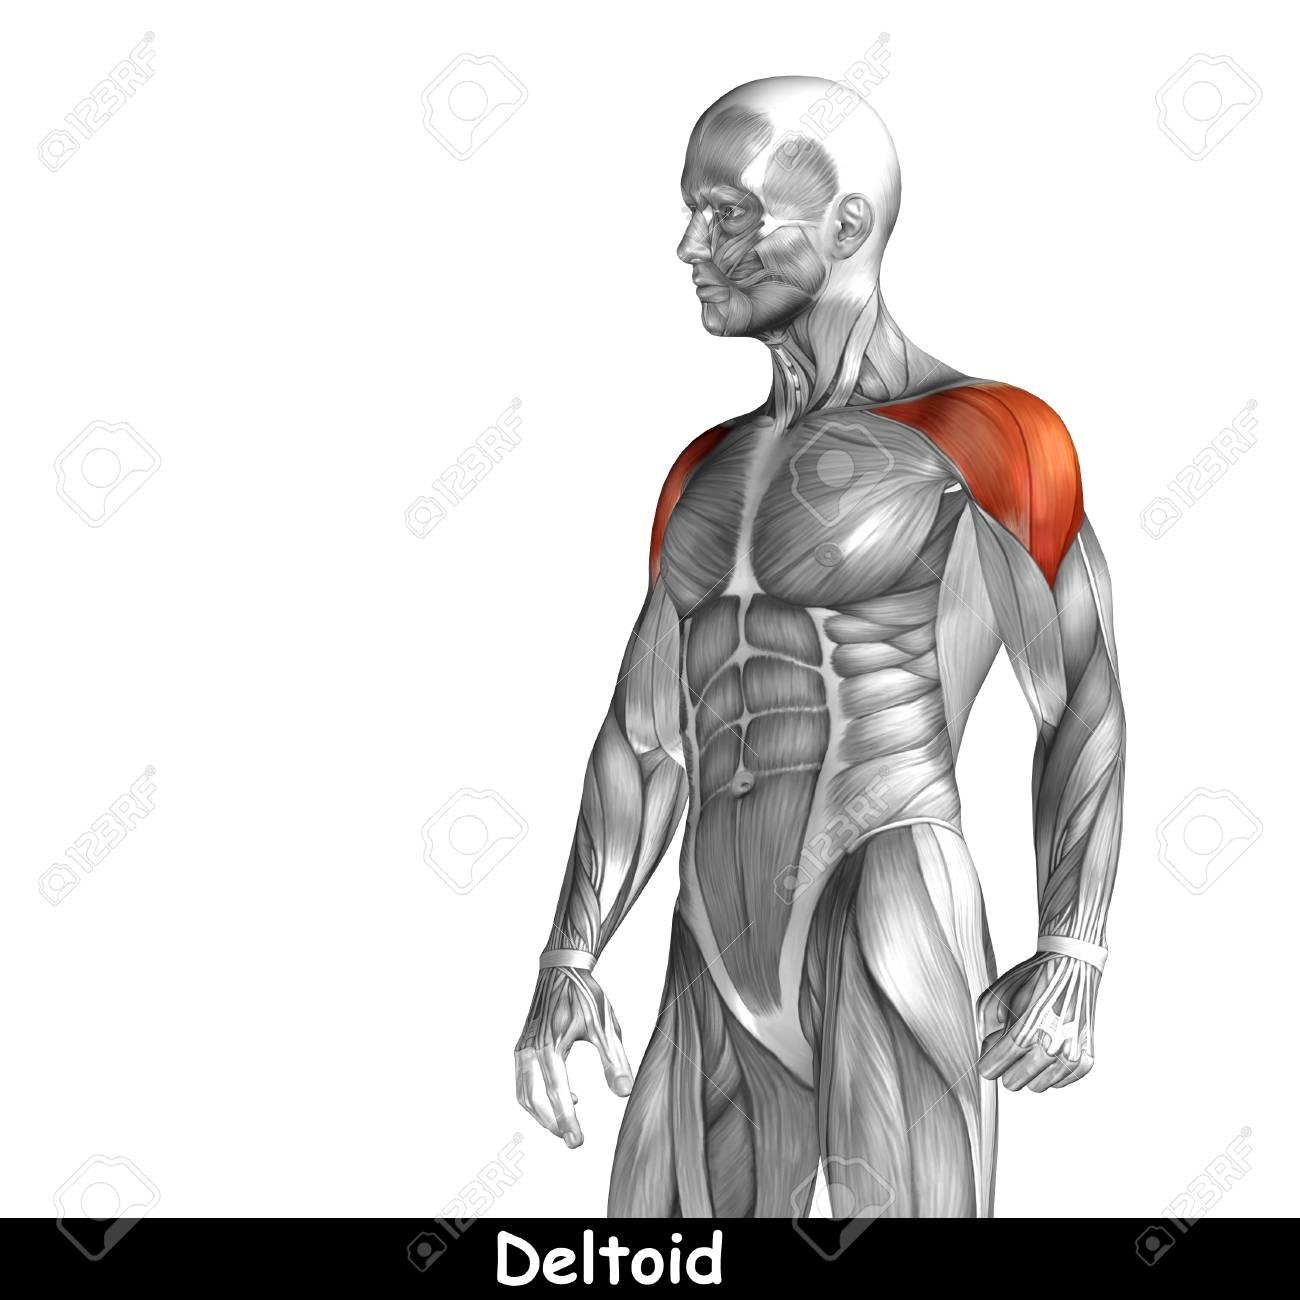 Encantador Pecho Muscular Composición - Imágenes de Anatomía Humana ...